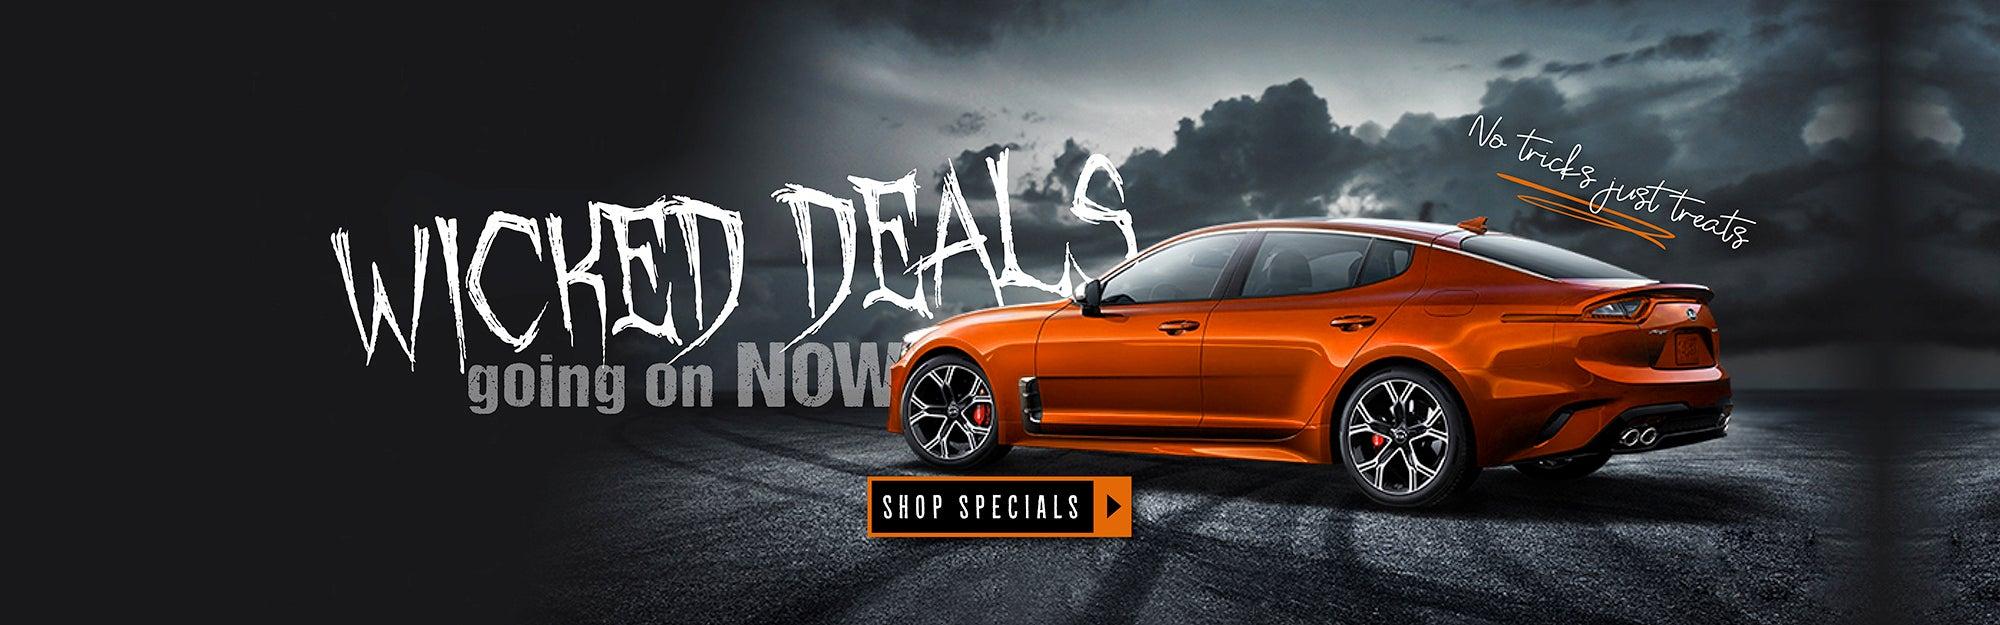 Used Car Dealerships In Mn >> Kia Dealer In Rochester Mn Used Cars Rochester Tom